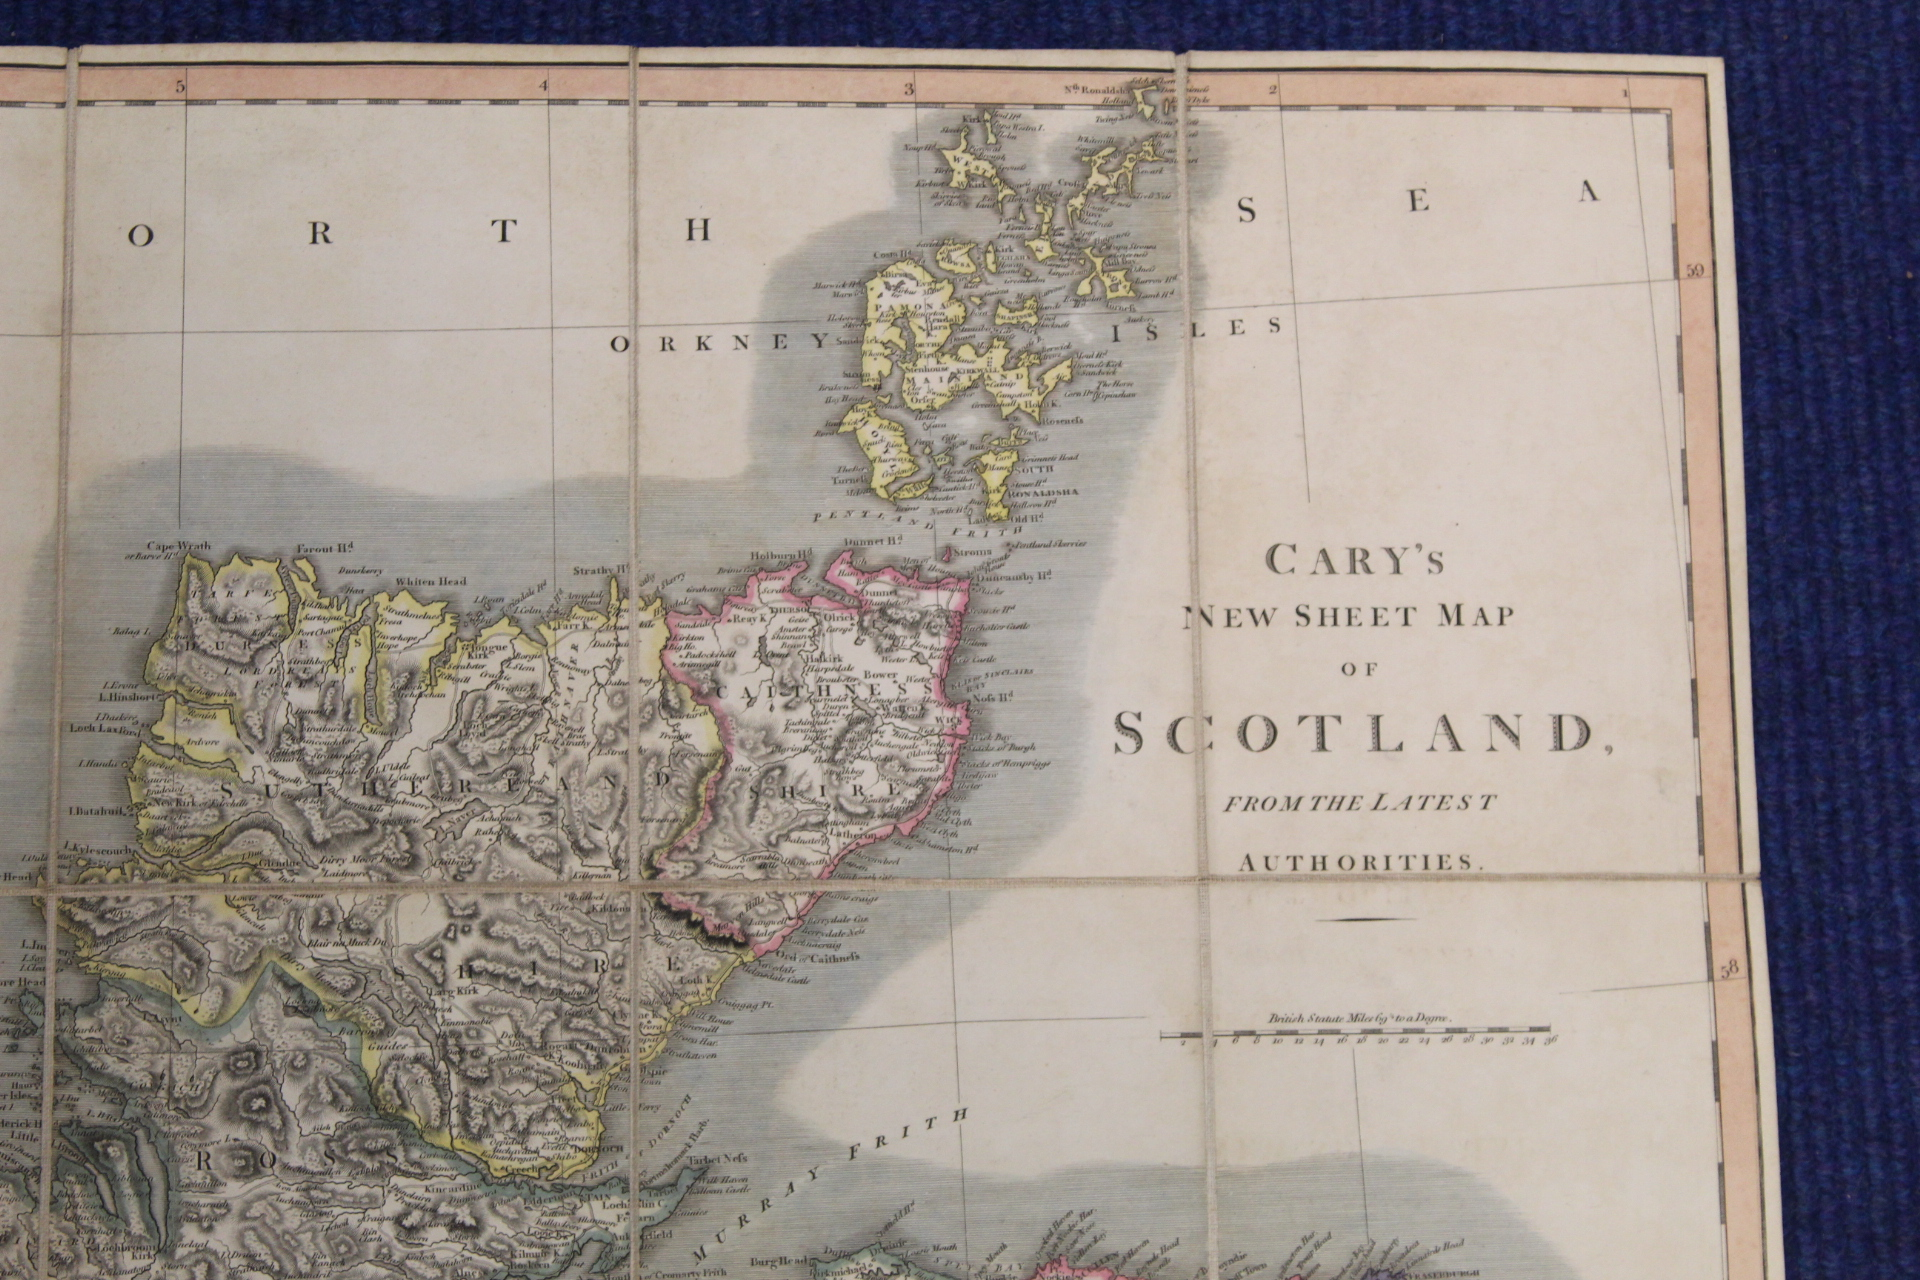 KIRKWOOD J. & SONS.Map of Scotland. Hand col. eng. fldg. linen map in well worn orig. slip case. - Image 34 of 36